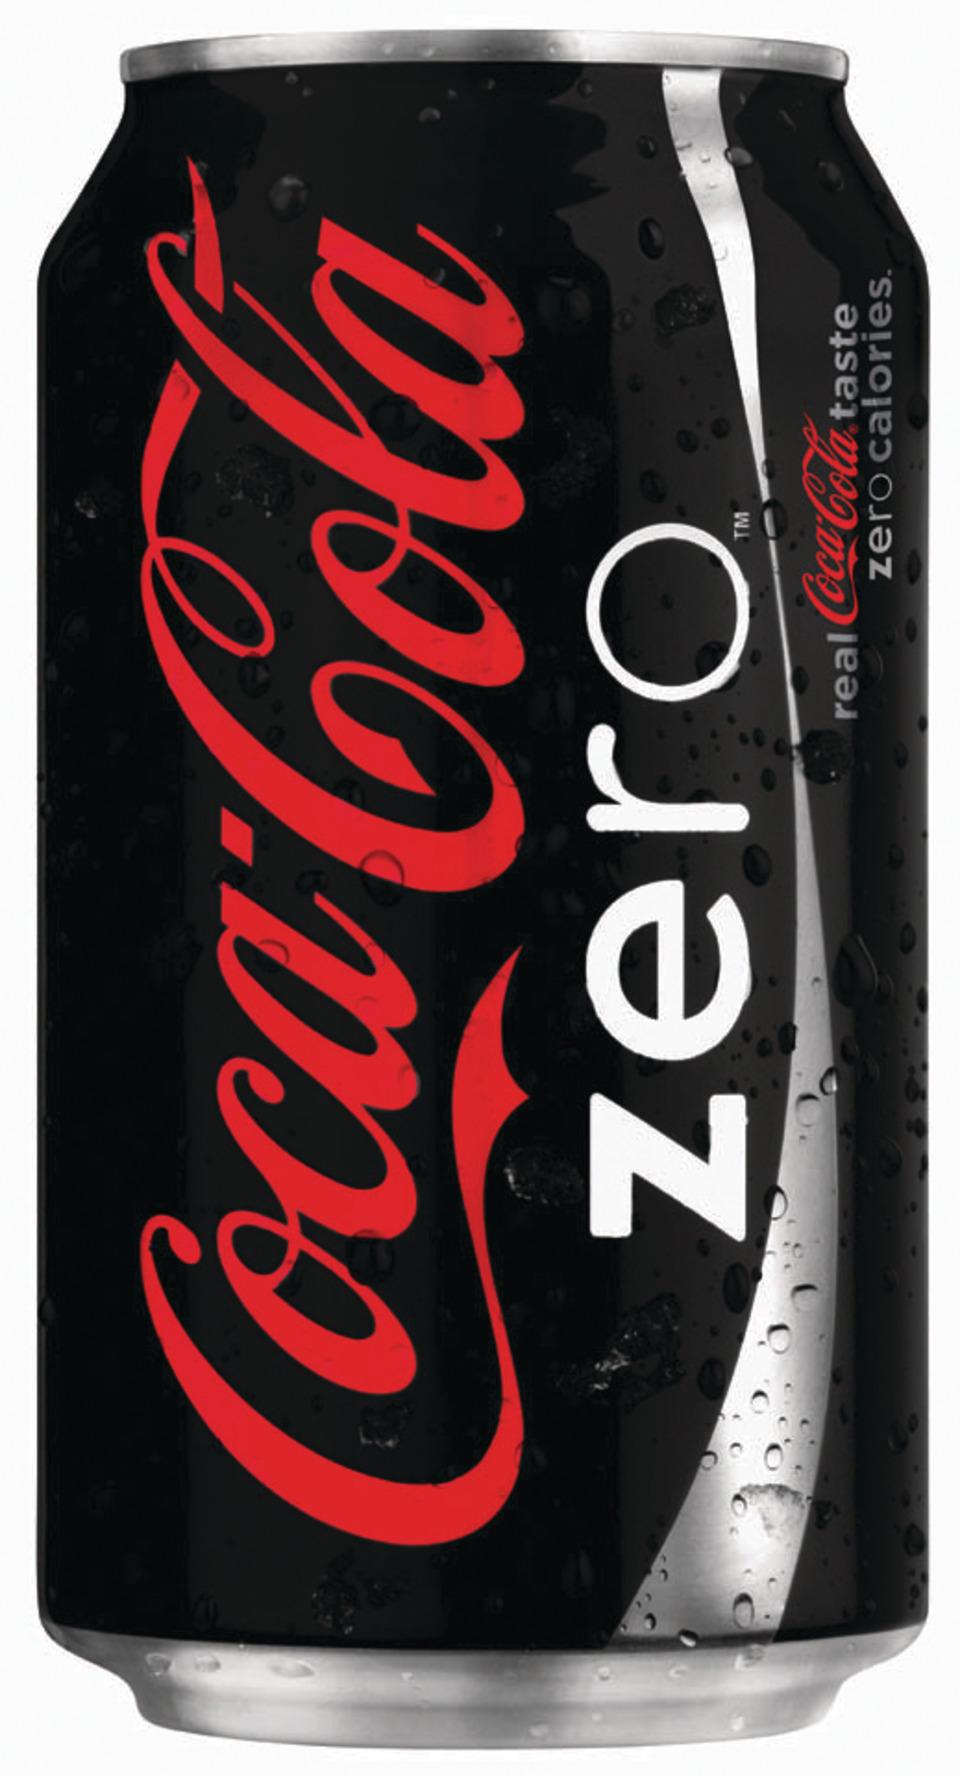 Coca-Cola Coca-Cola Zero in Beverage